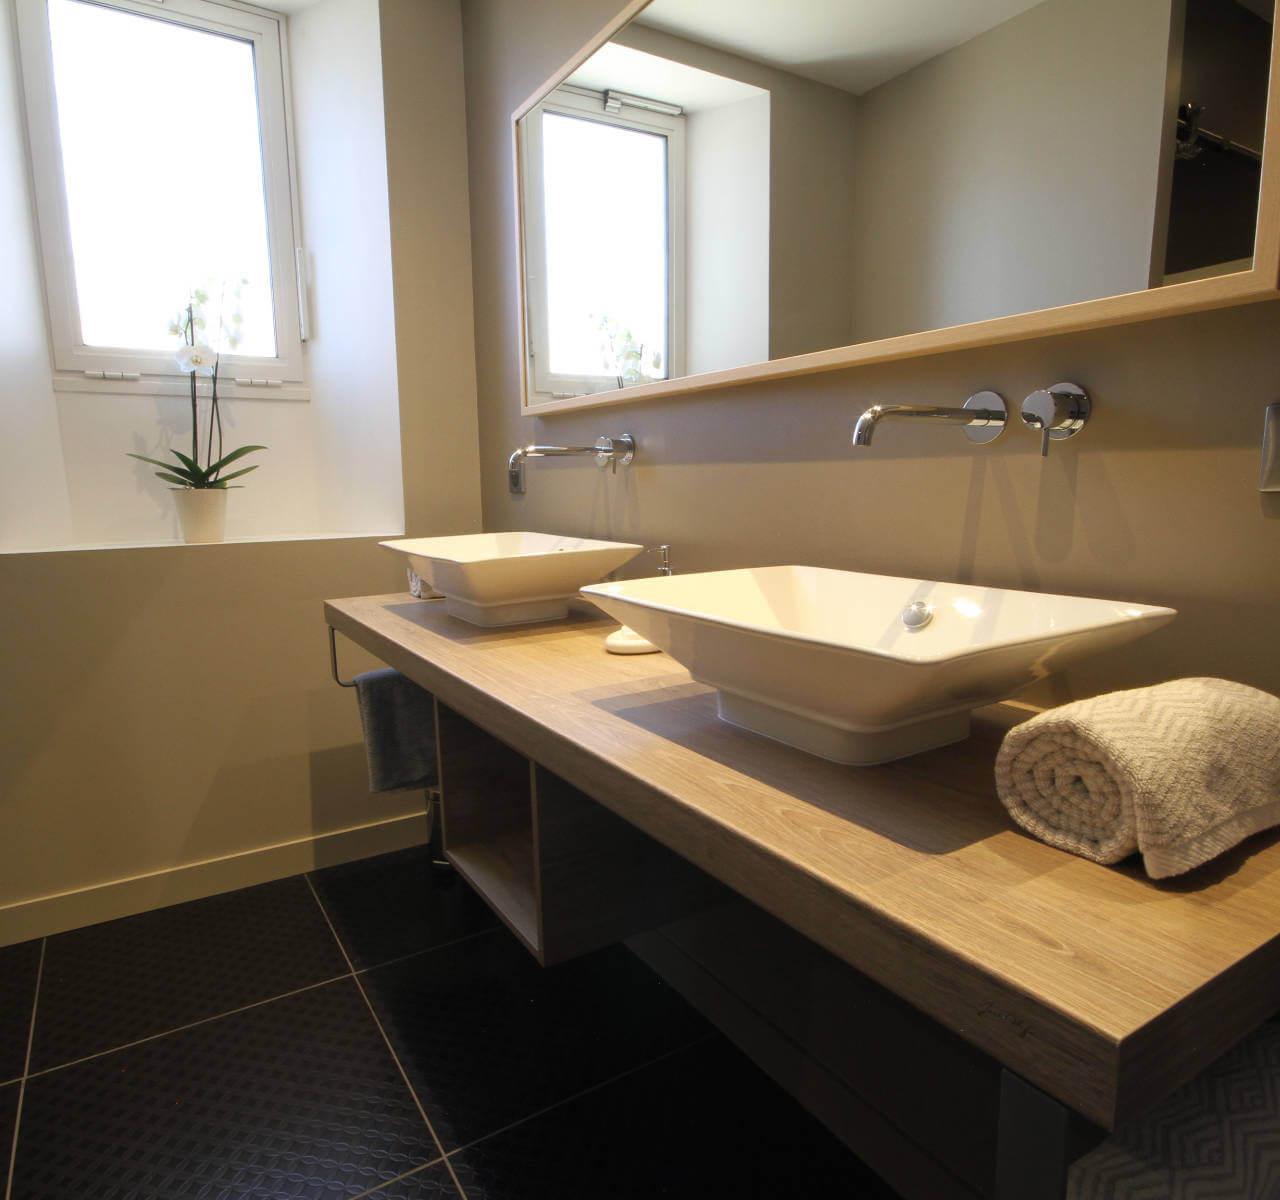 Opérie - Chambre Chêne Merrain - salle de bain